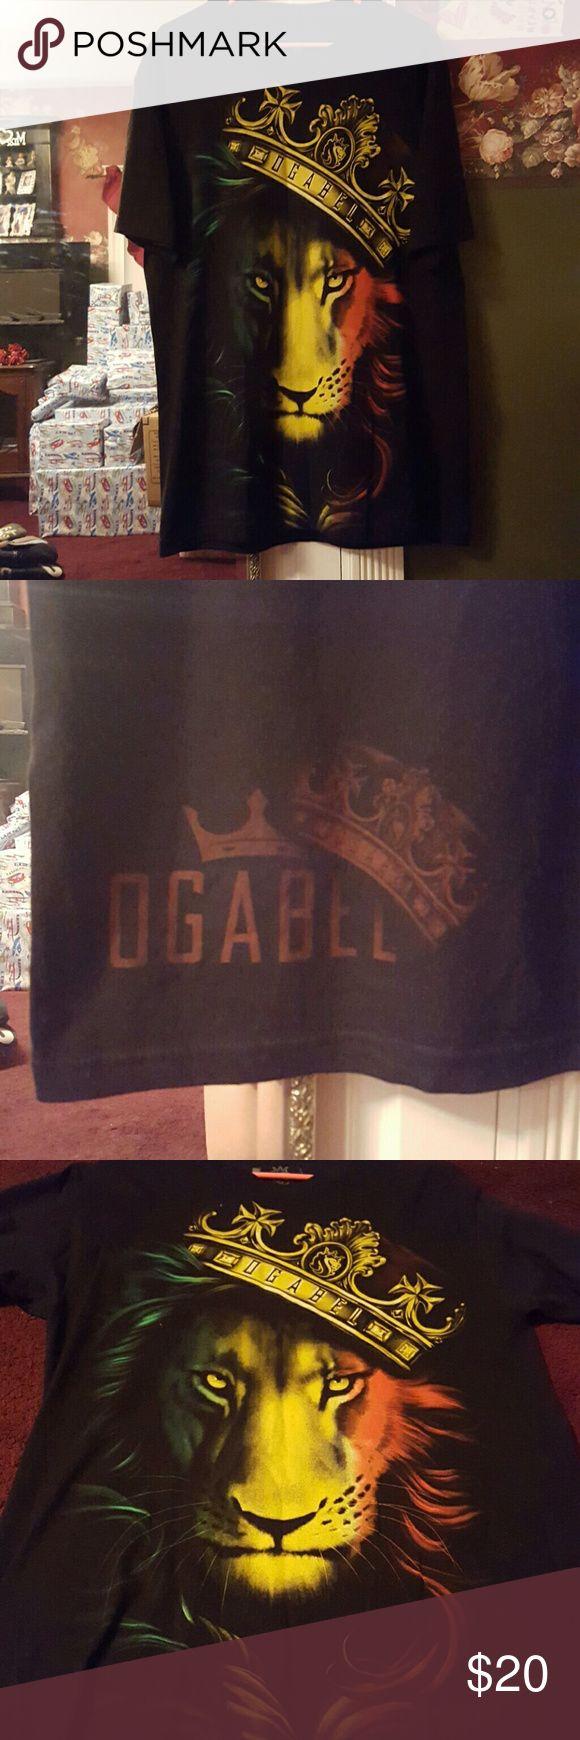 Ogabel men's graphic short sleeve shirt EUC men's graphic short sleeve shirt, rasta lion graphic. Ogabel Shirts Tees - Short Sleeve